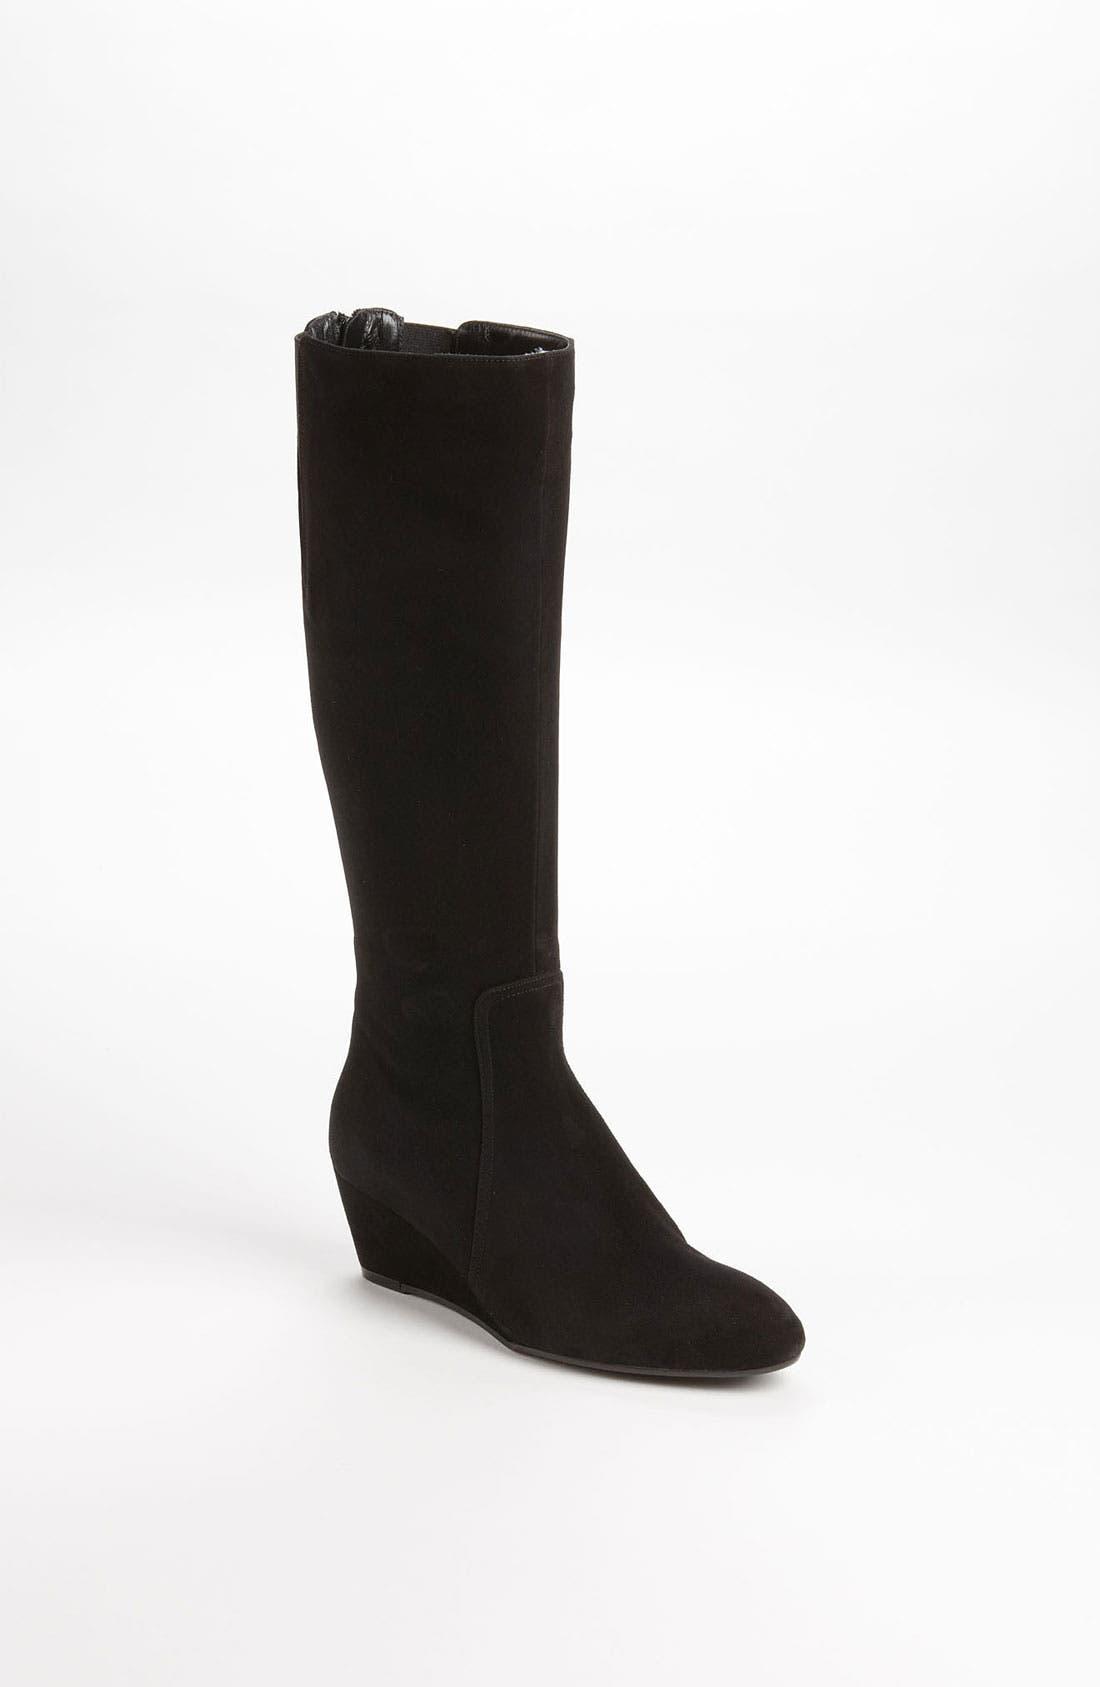 Alternate Image 1 Selected - Dana Davis 'Pax' Boot